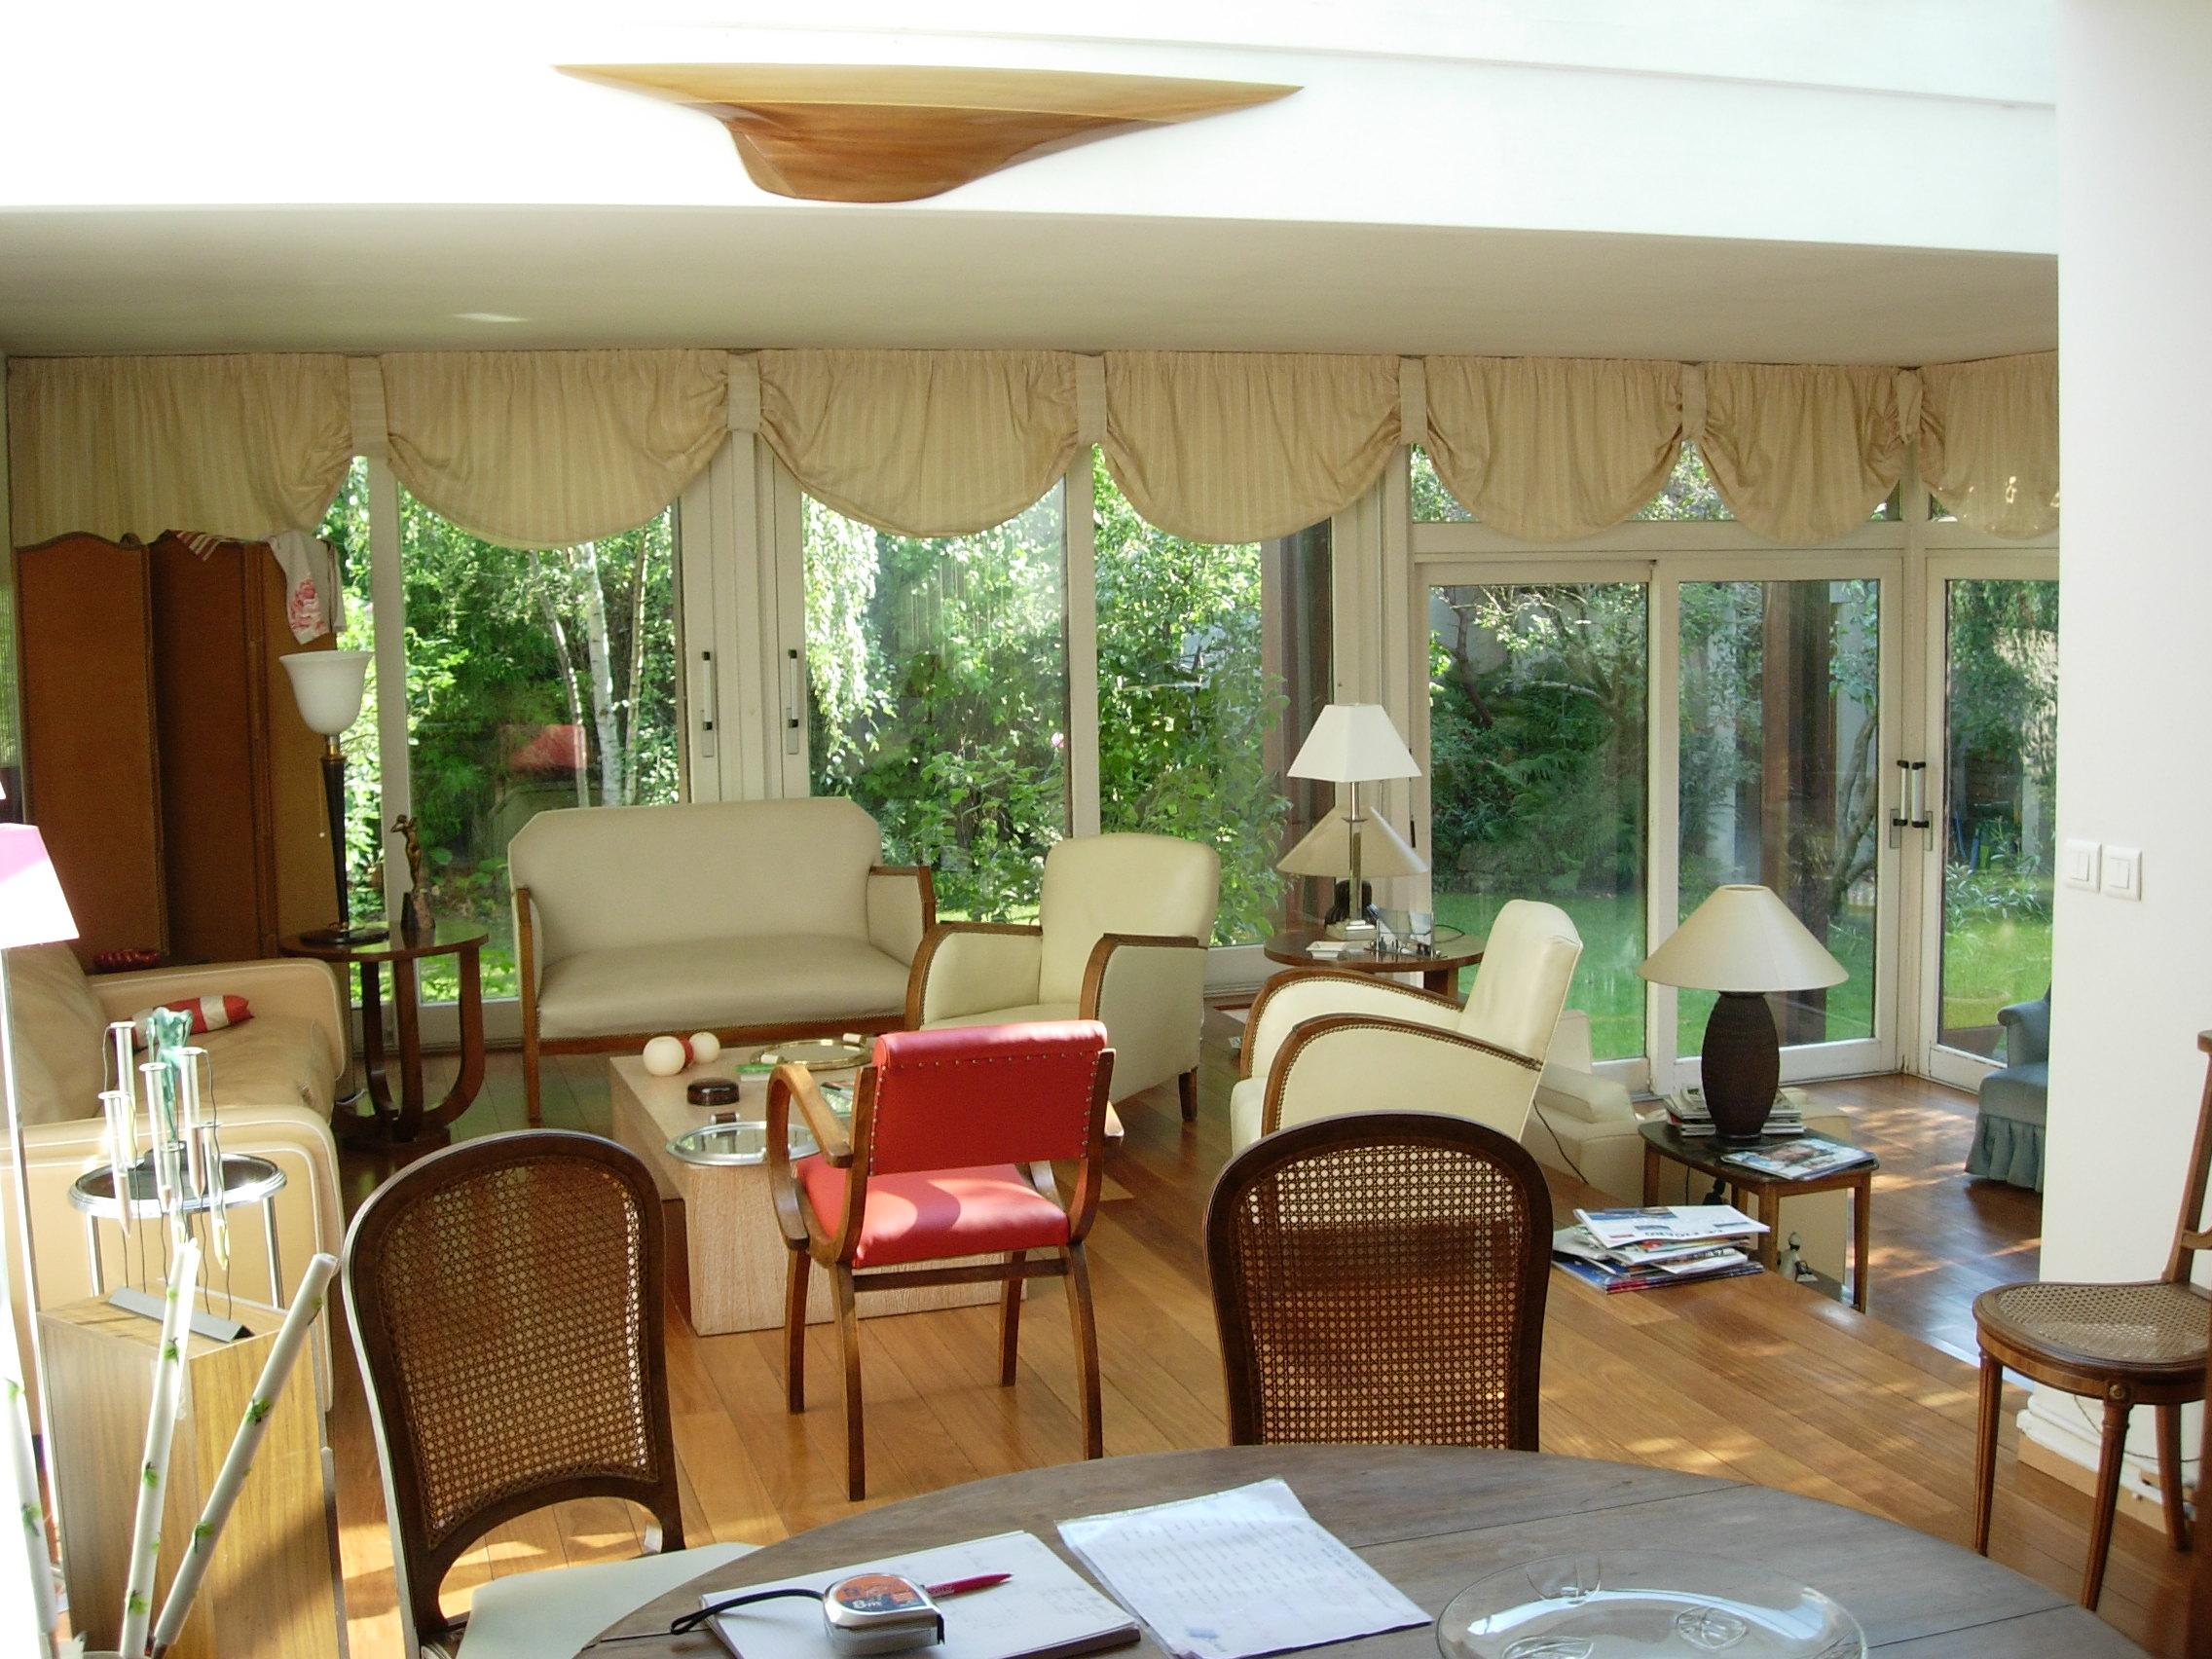 travaux d int rieur guidarelli. Black Bedroom Furniture Sets. Home Design Ideas